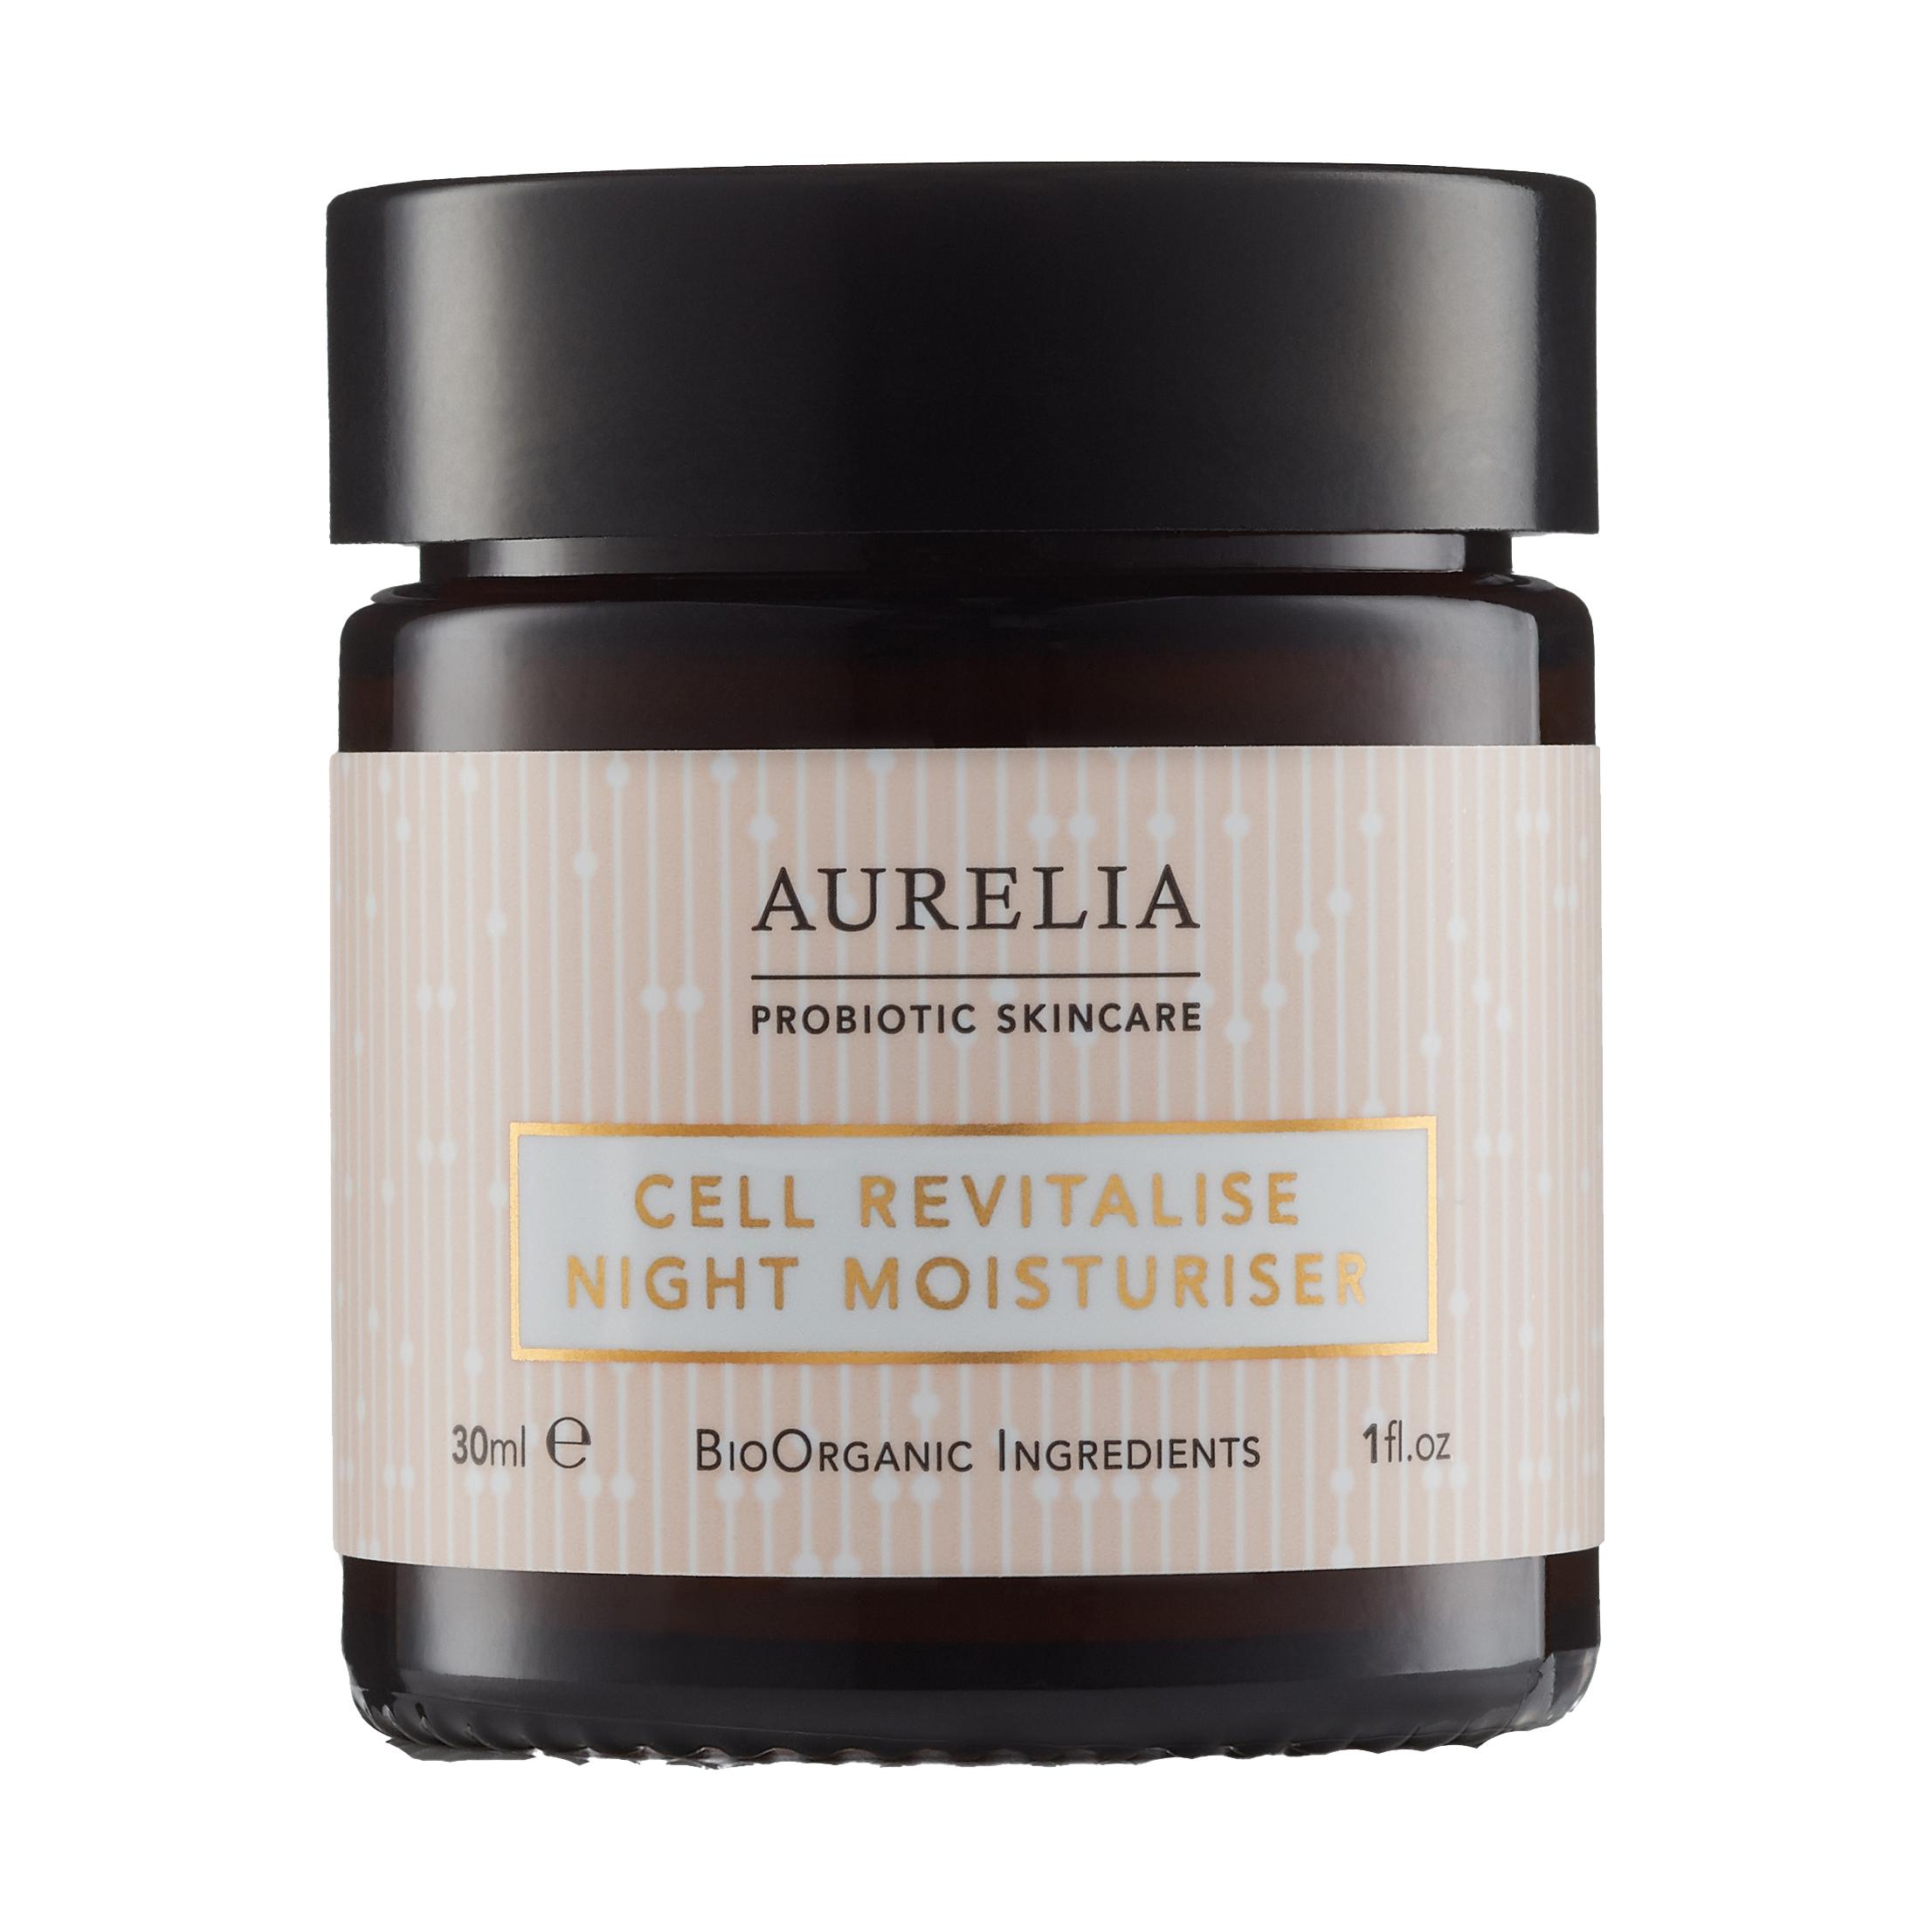 Aurelia Cell Revitalise Night Moisturiser, 30 ml